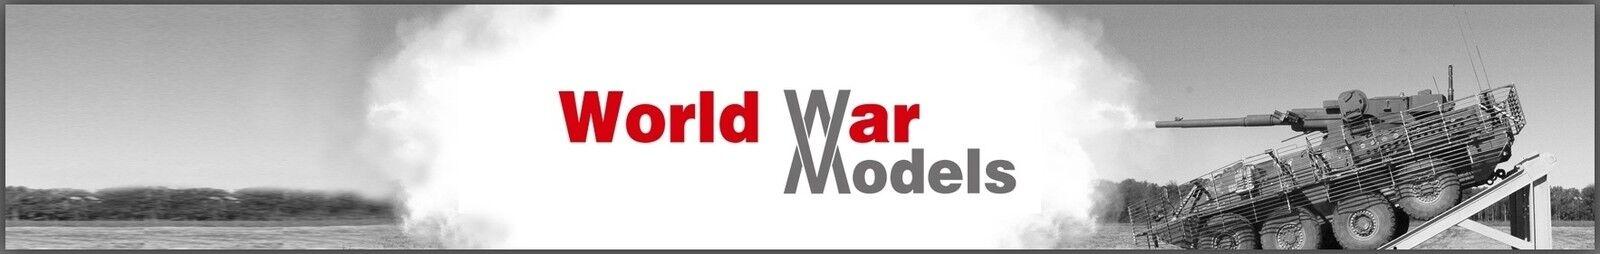 worldwarmodels